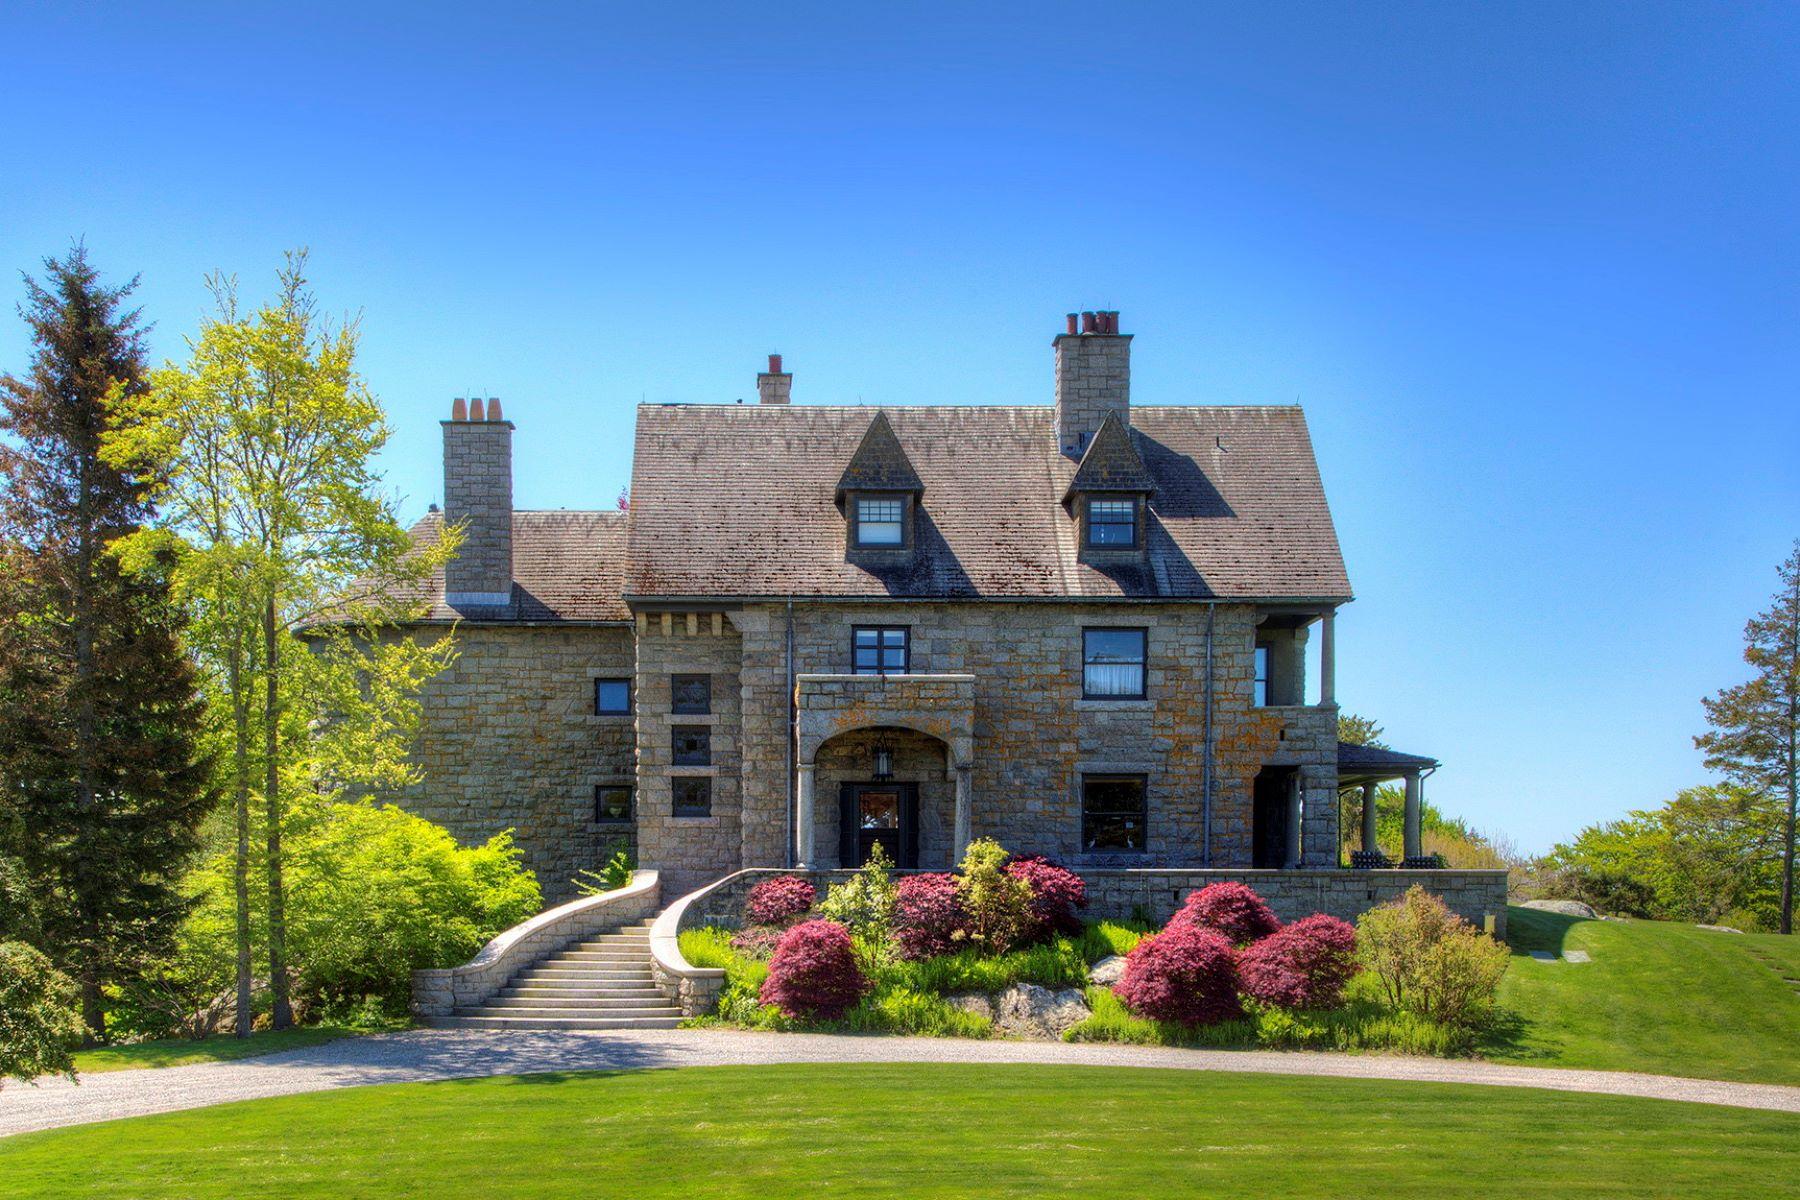 独户住宅 为 销售 在 Wild Moor Estate 21 Hammersmith Road 纽波特, 02840 美国